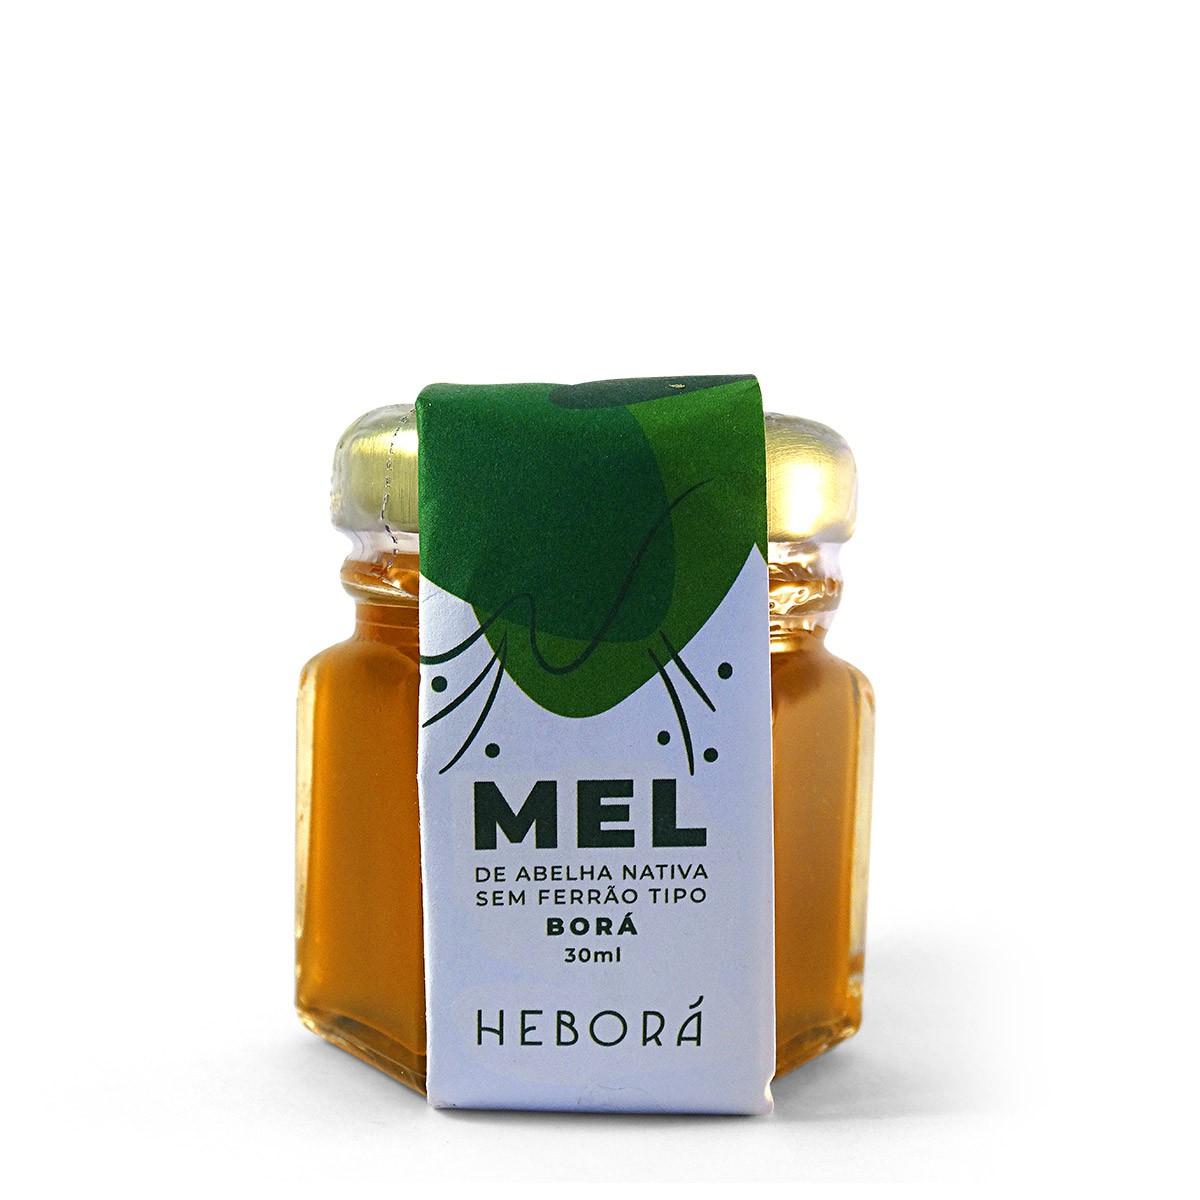 Mel de Abelha Nativa BORÁ Heborá 30ml